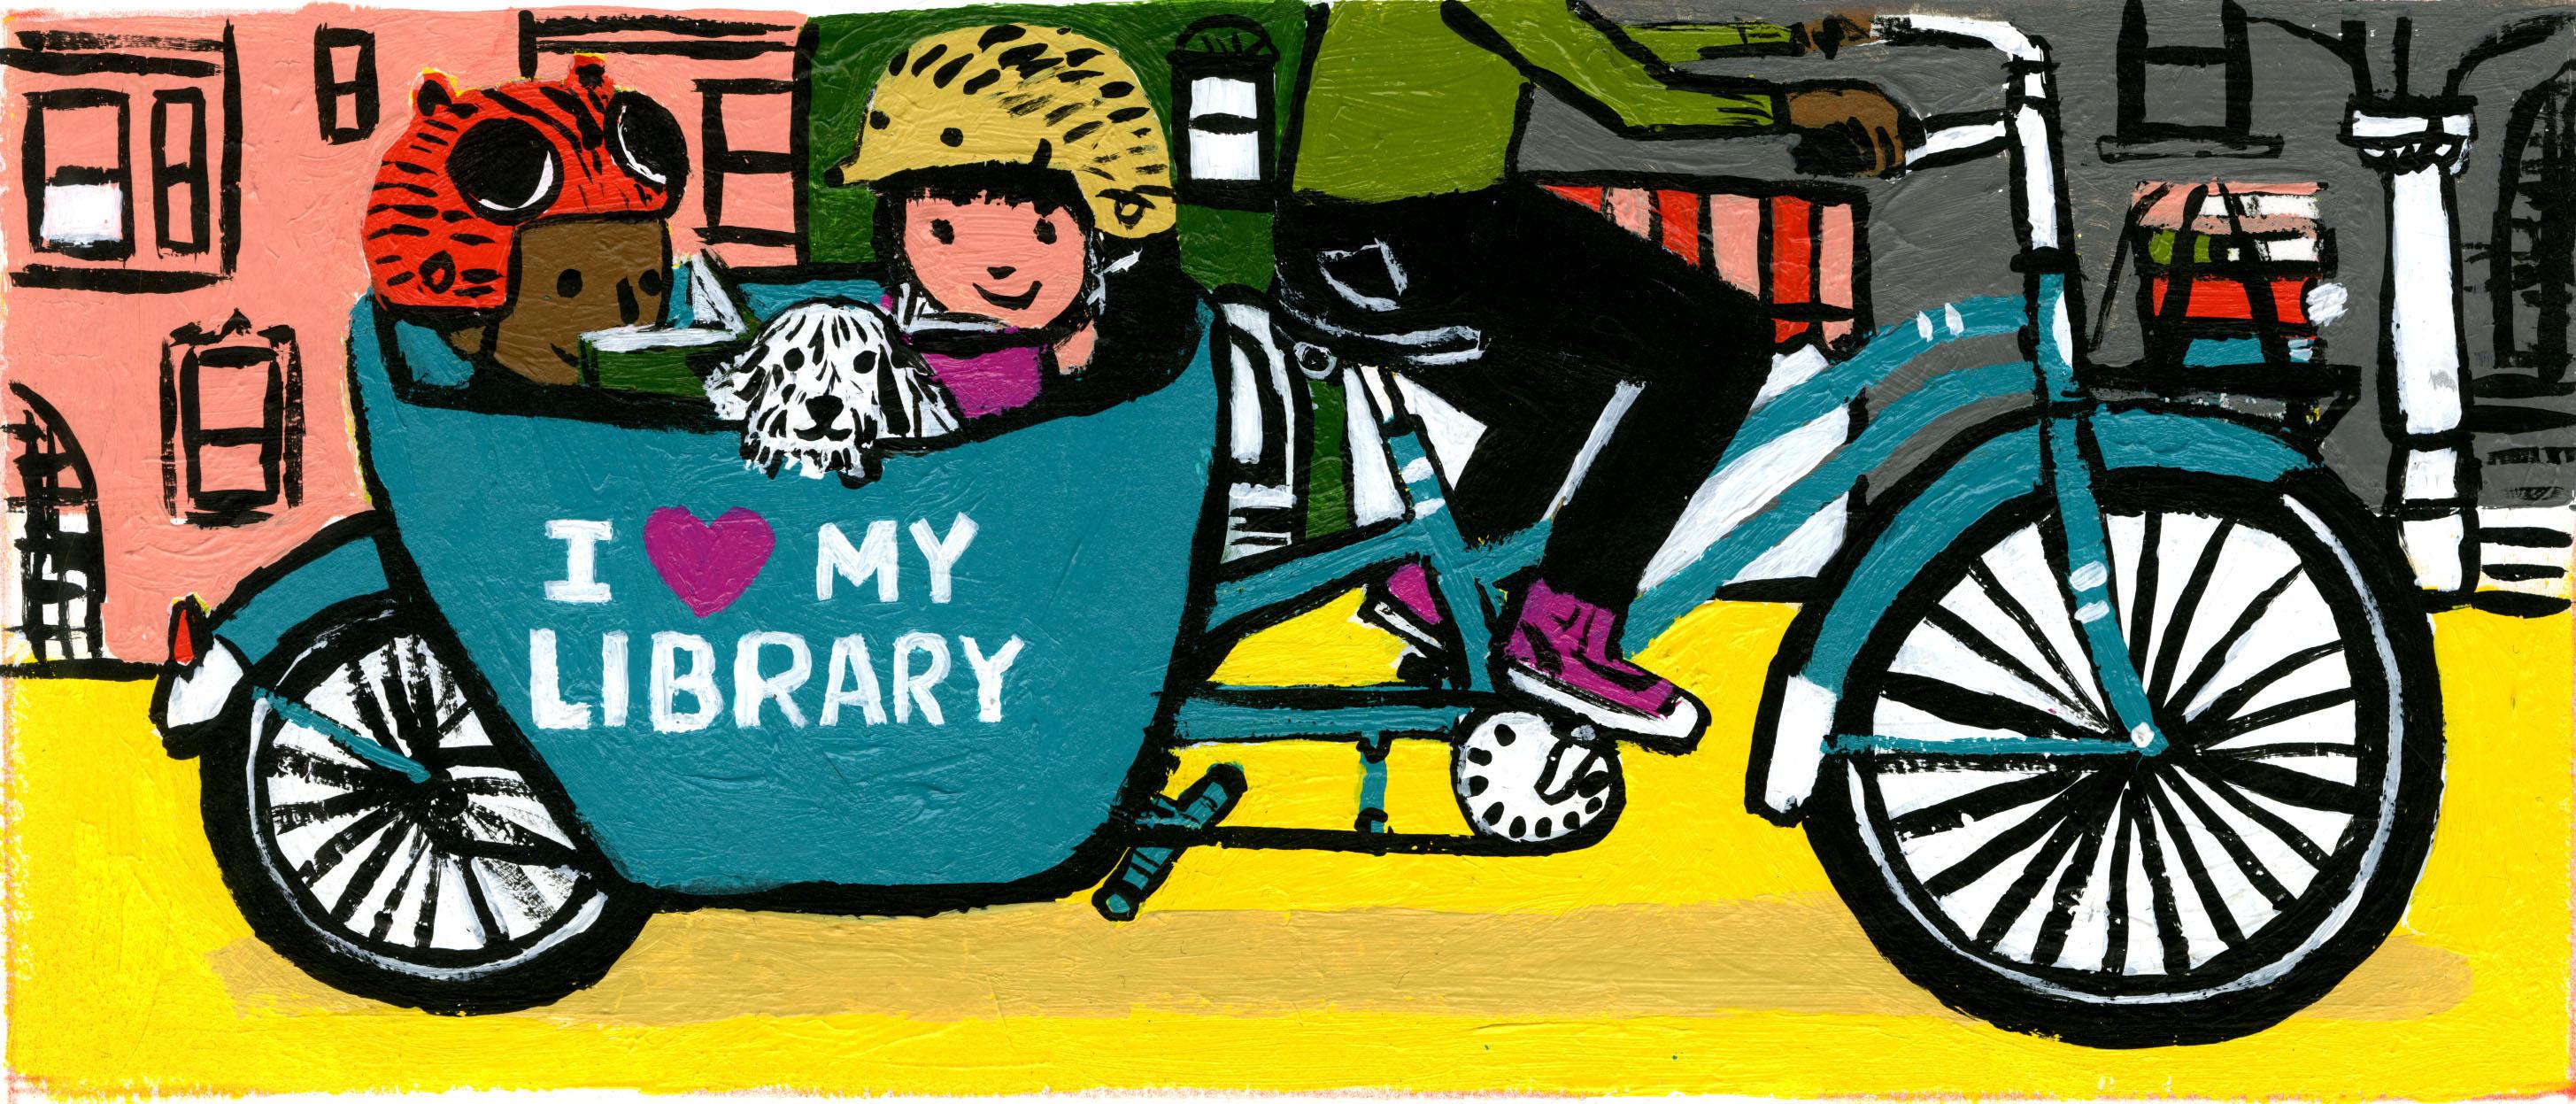 Illustration of family on bike by Zachariah OHora